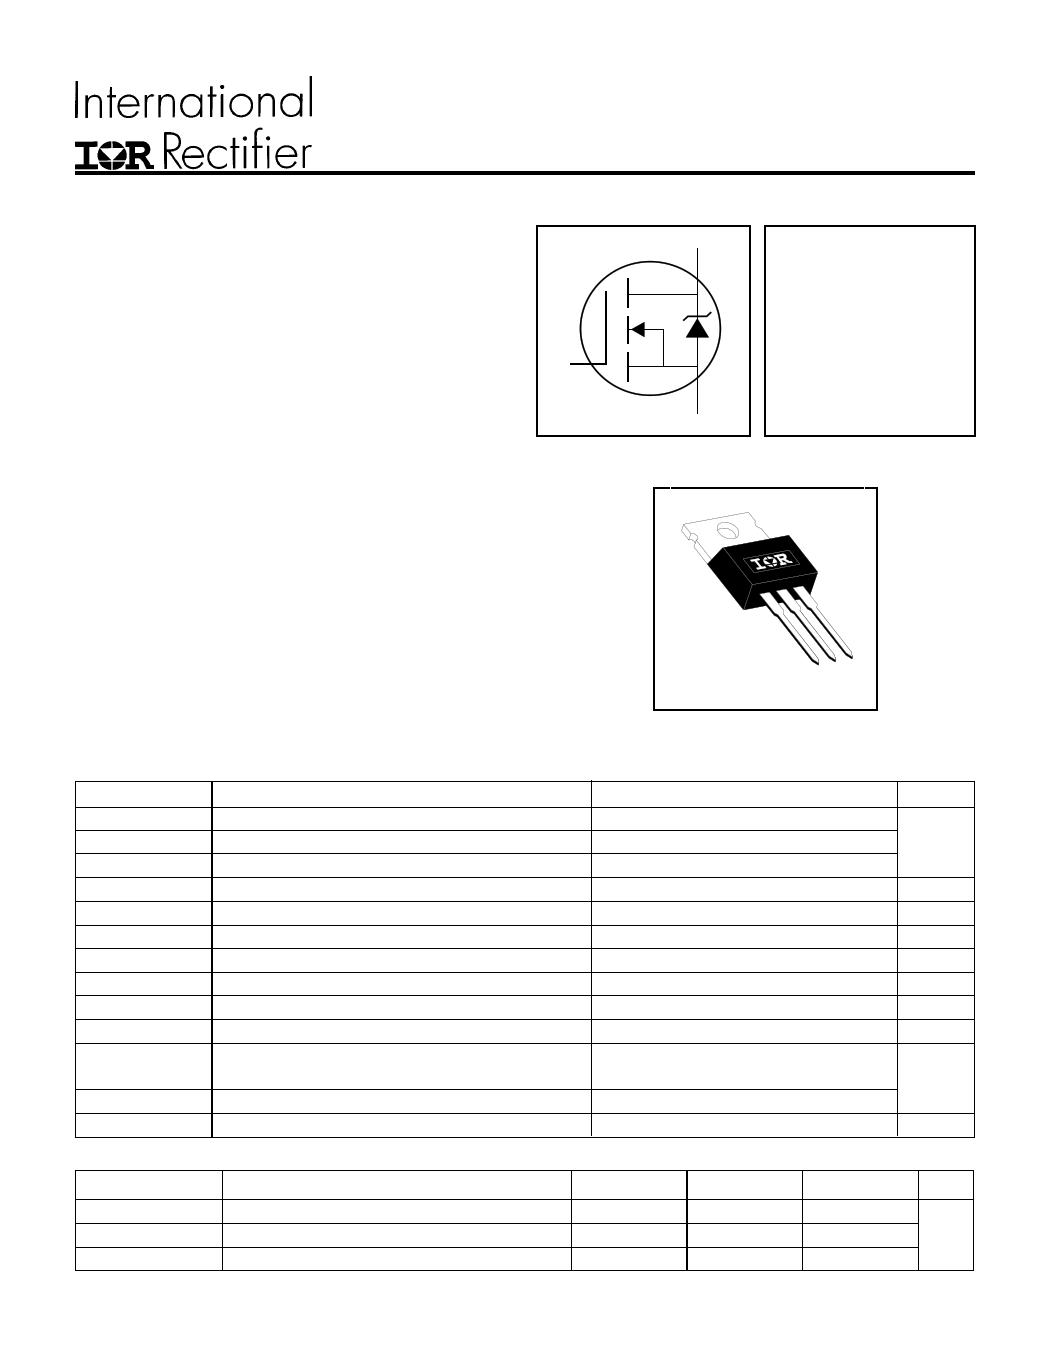 IRFZ34N Datasheet, IRFZ34N PDF,ピン配置, 機能